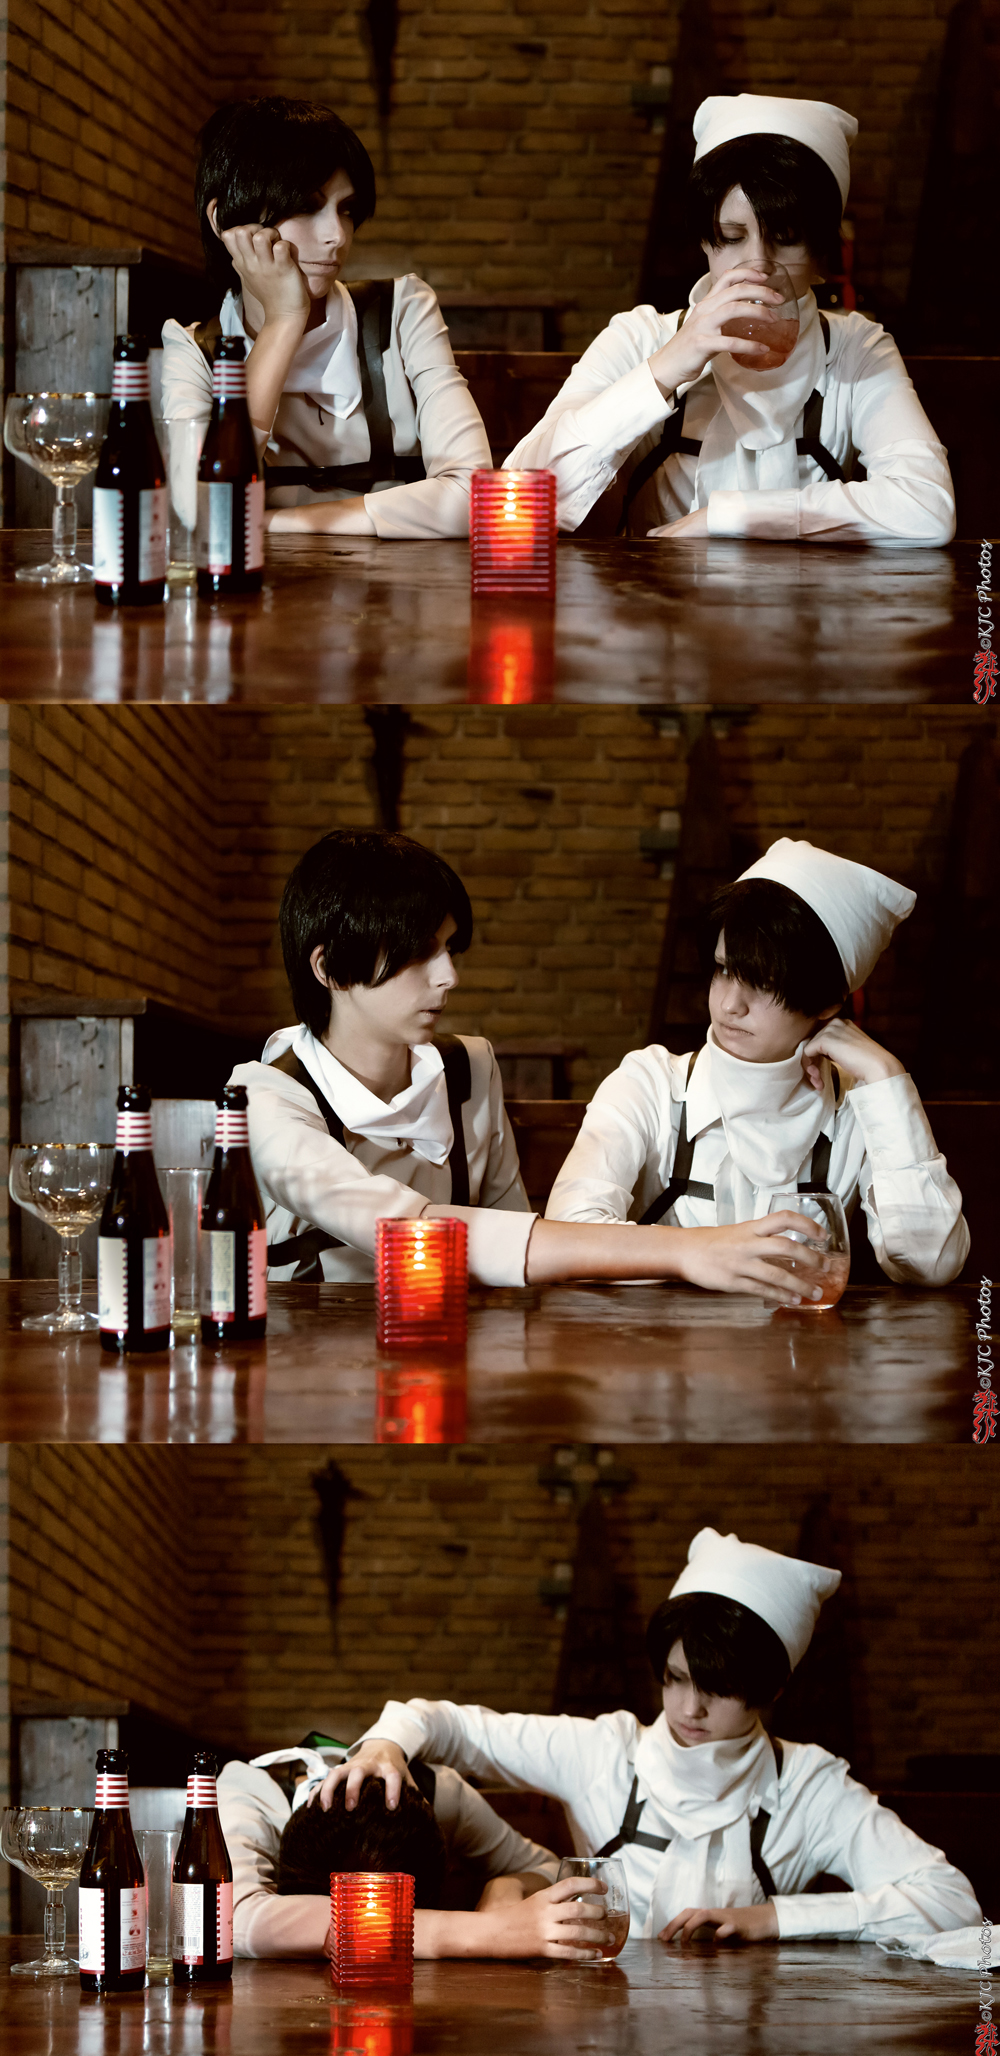 Shingeki no Kyojin - Grabbing a drink by ShamanRenji